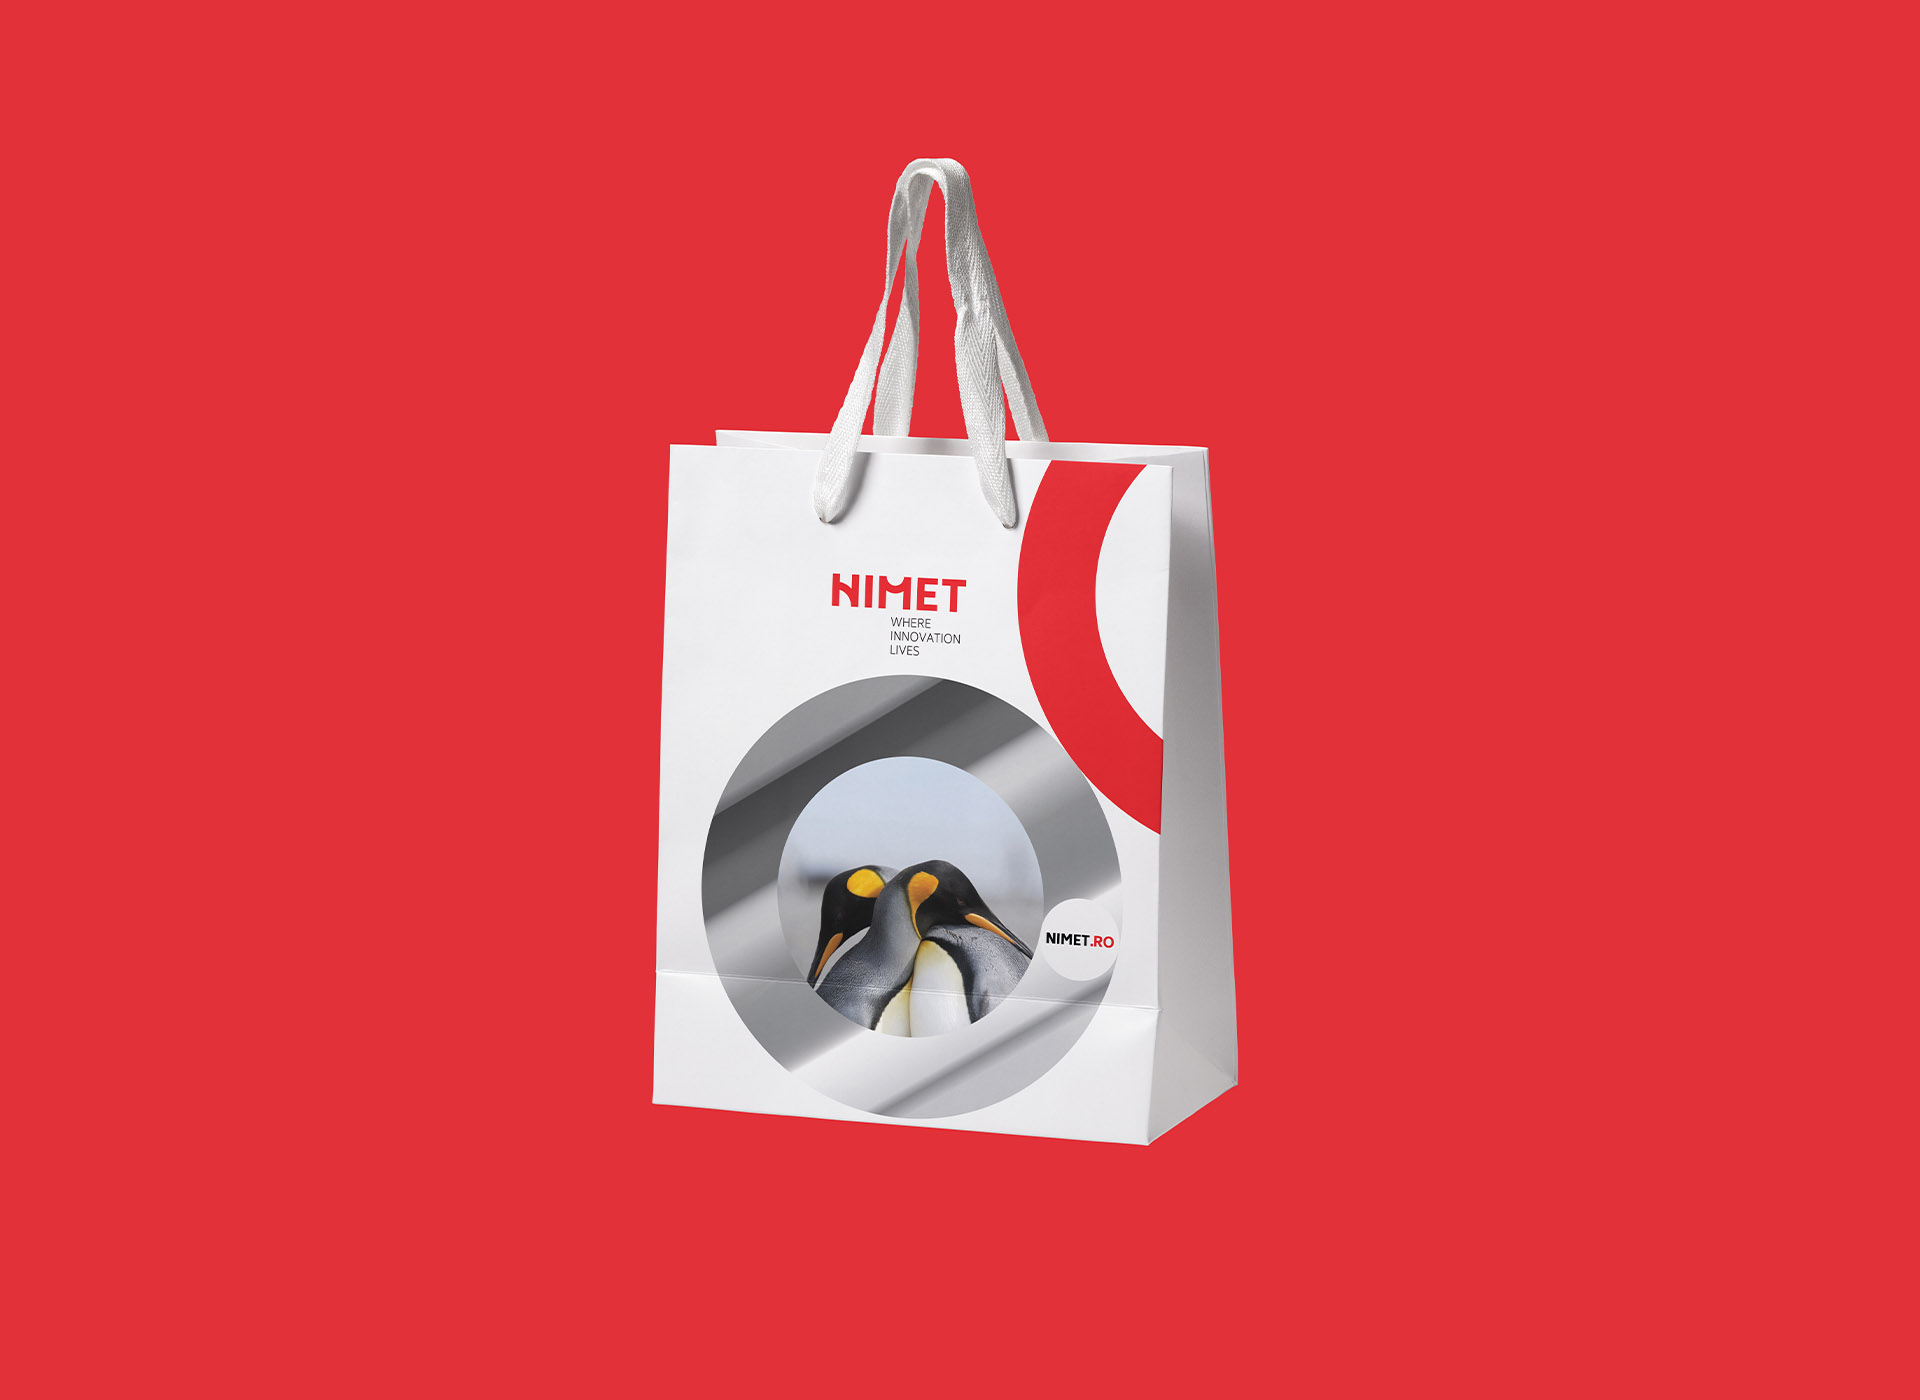 NIMET portofoliu inoveo bag